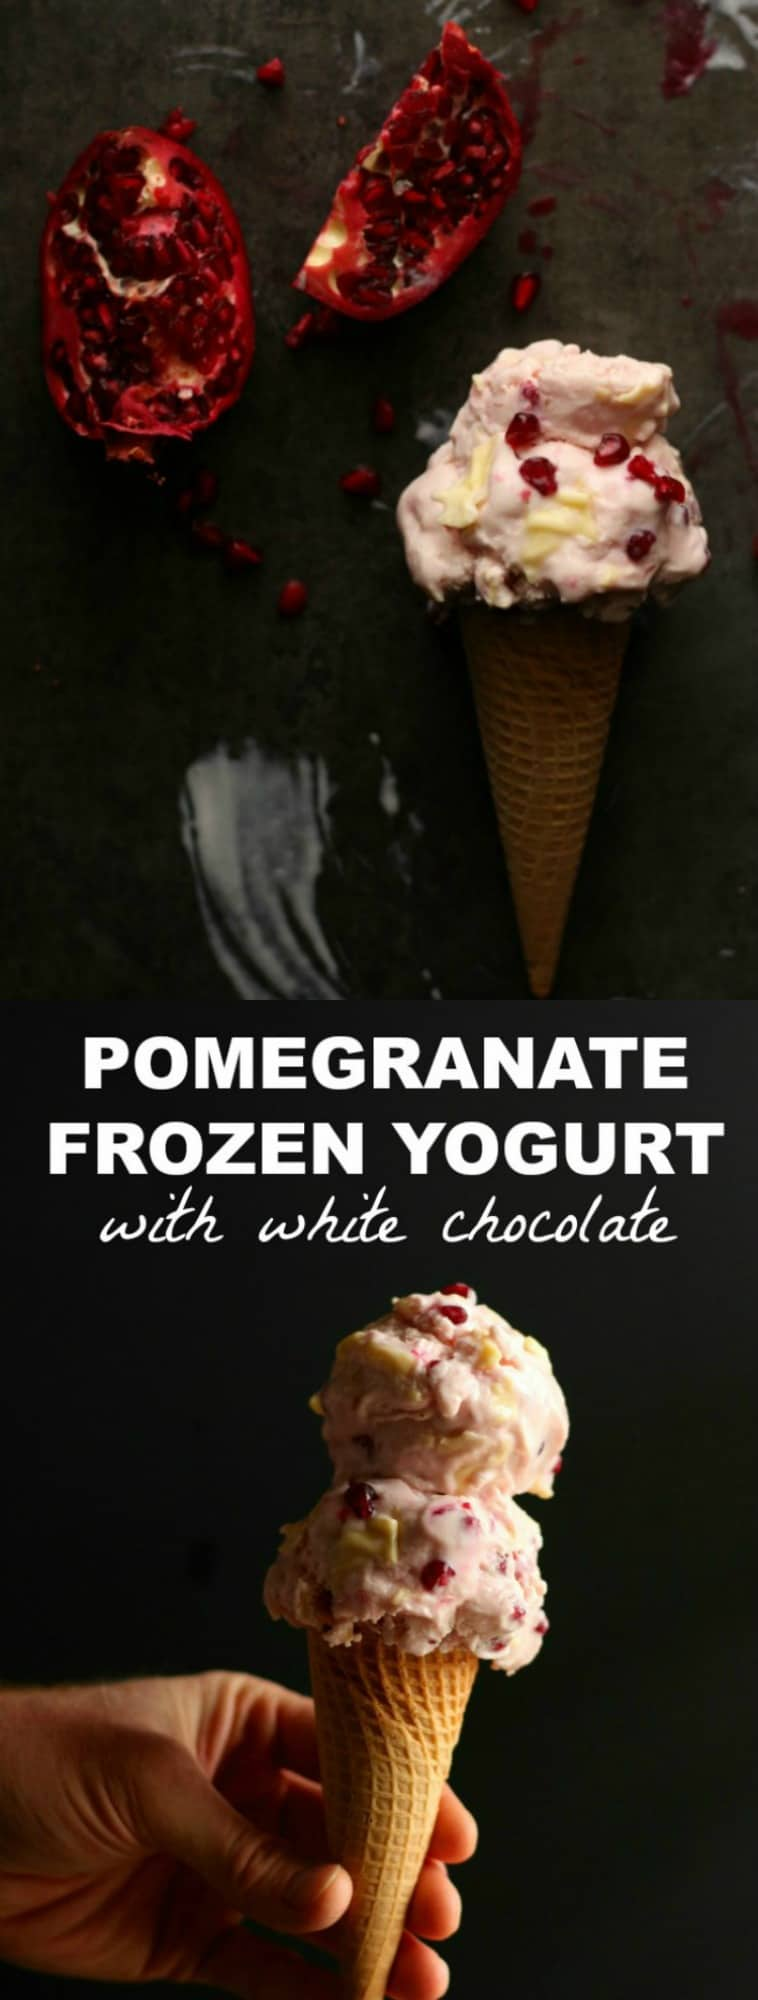 Pomegranate Frozen Yogurt with White Chocolate Skinny Dessert Idea